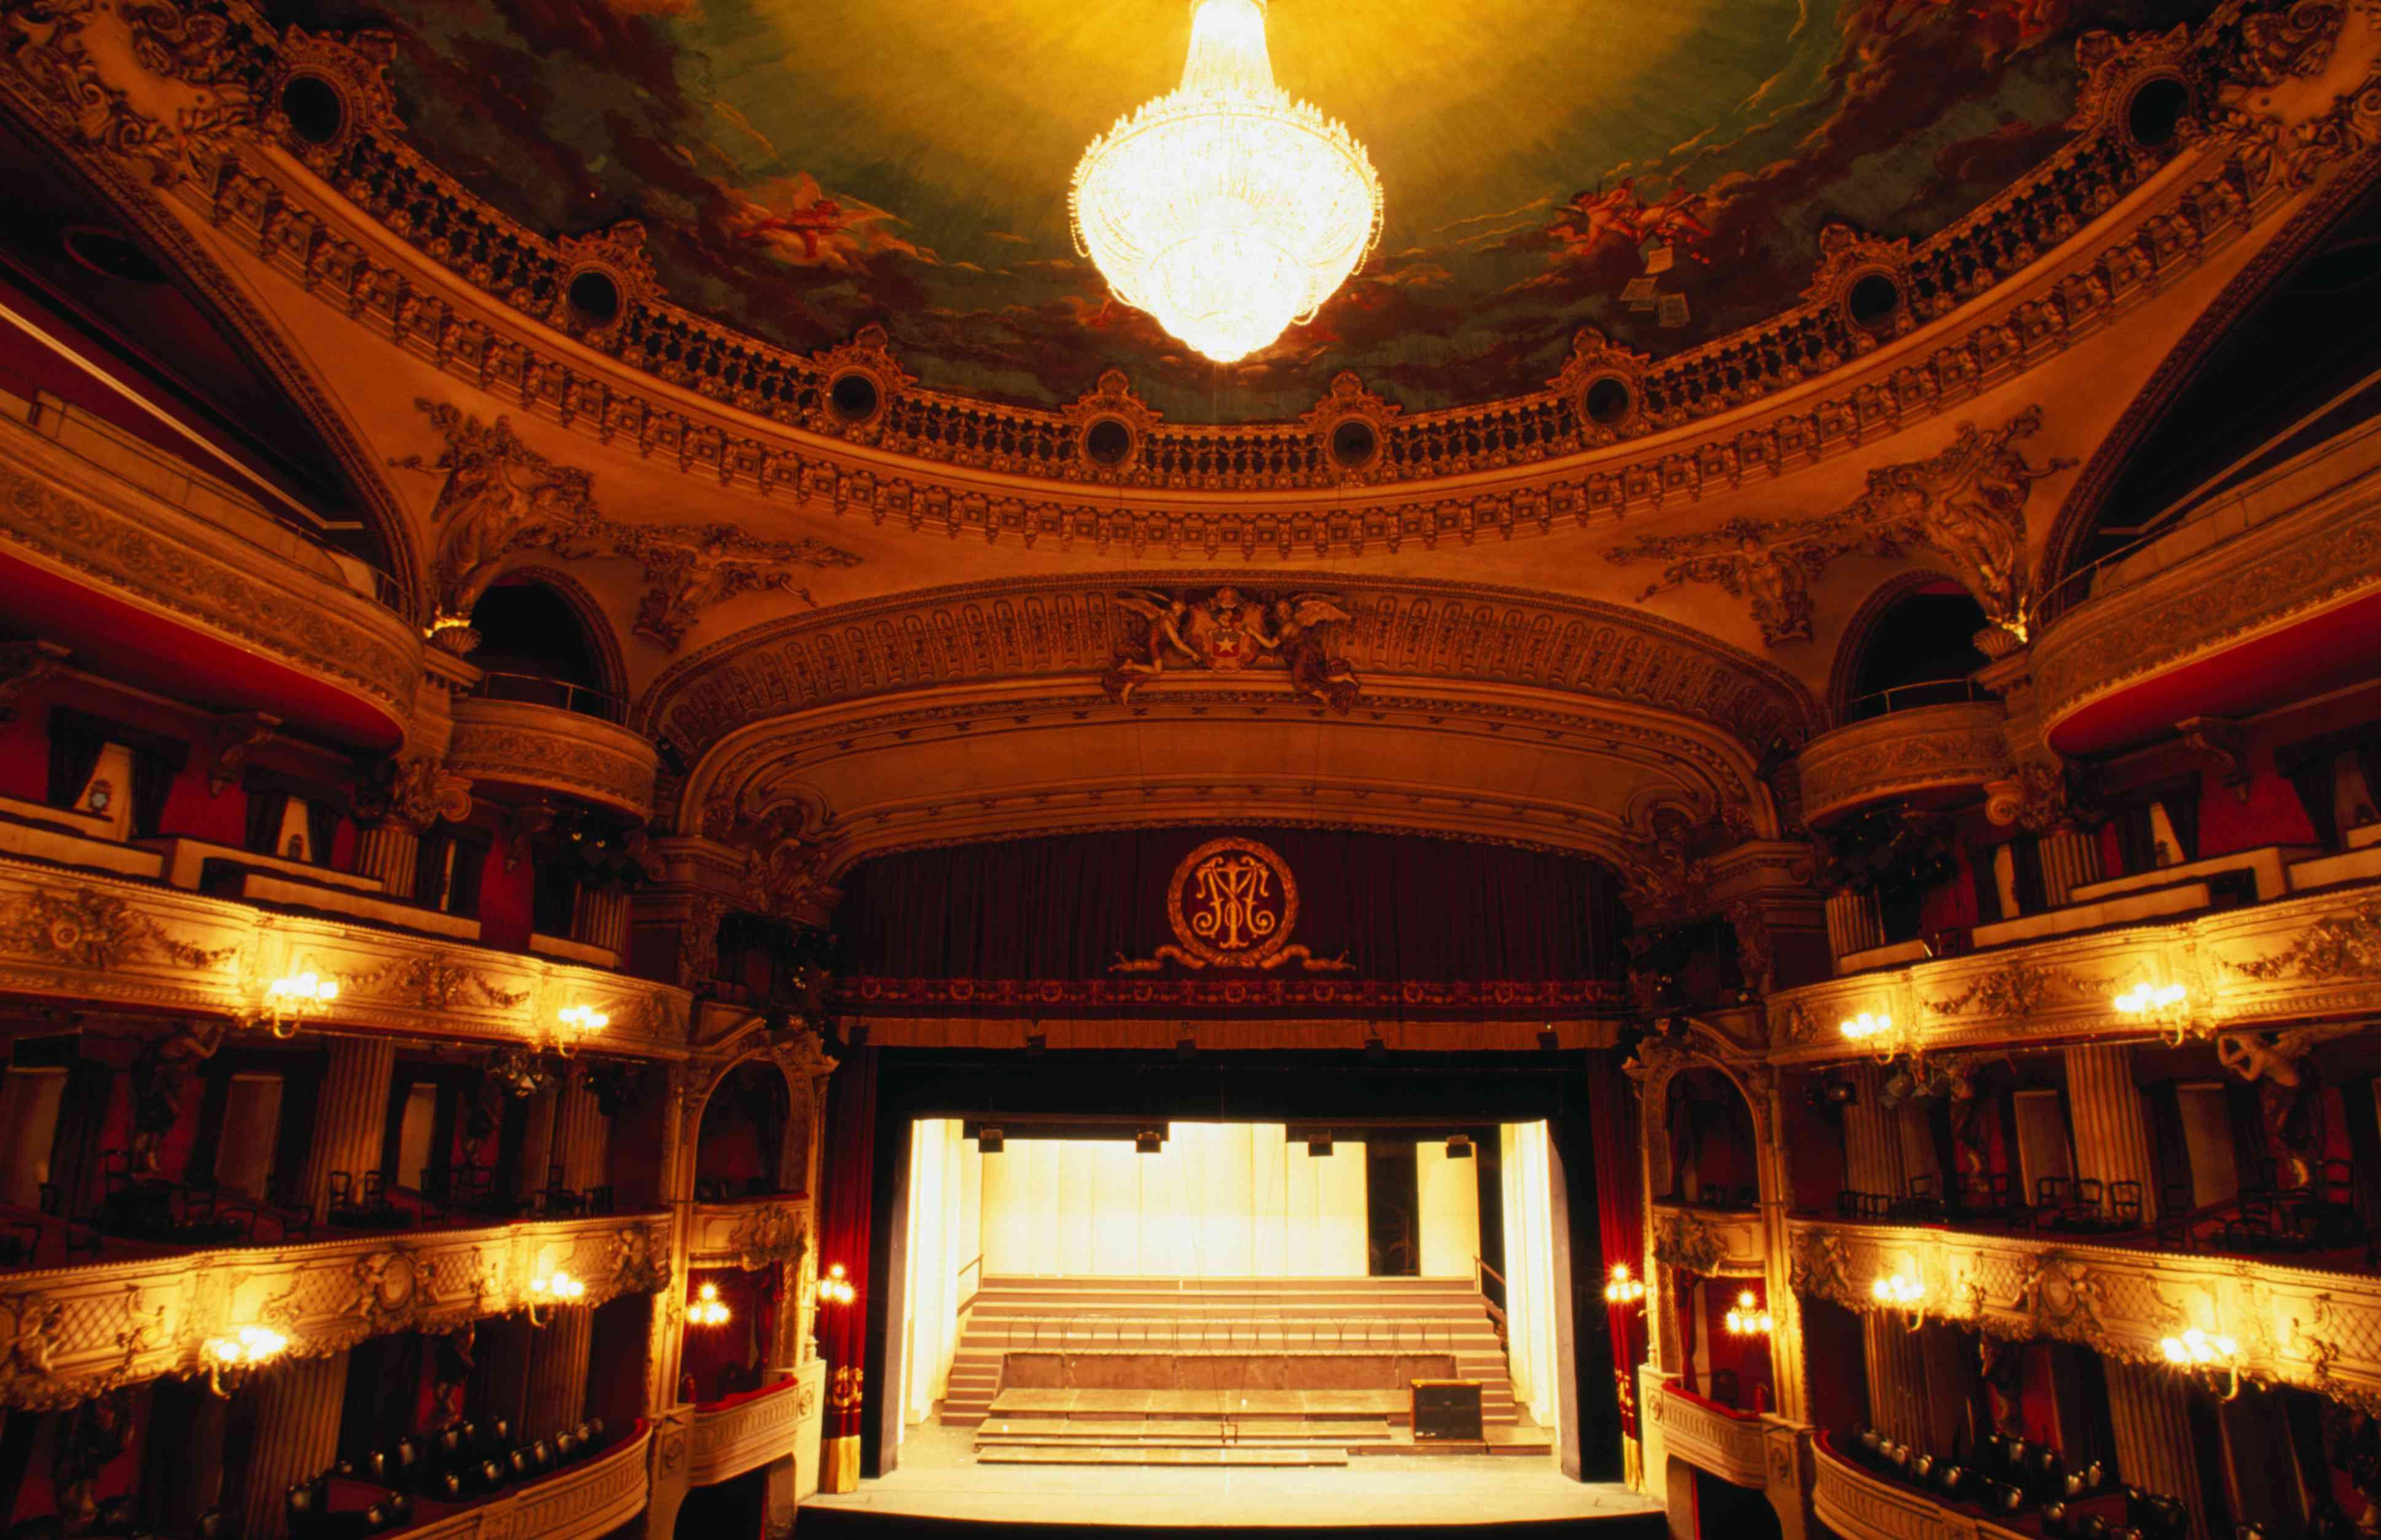 Teatro Municipal de Santiago (Santiago Opera House). The historic theater was built in 1876.